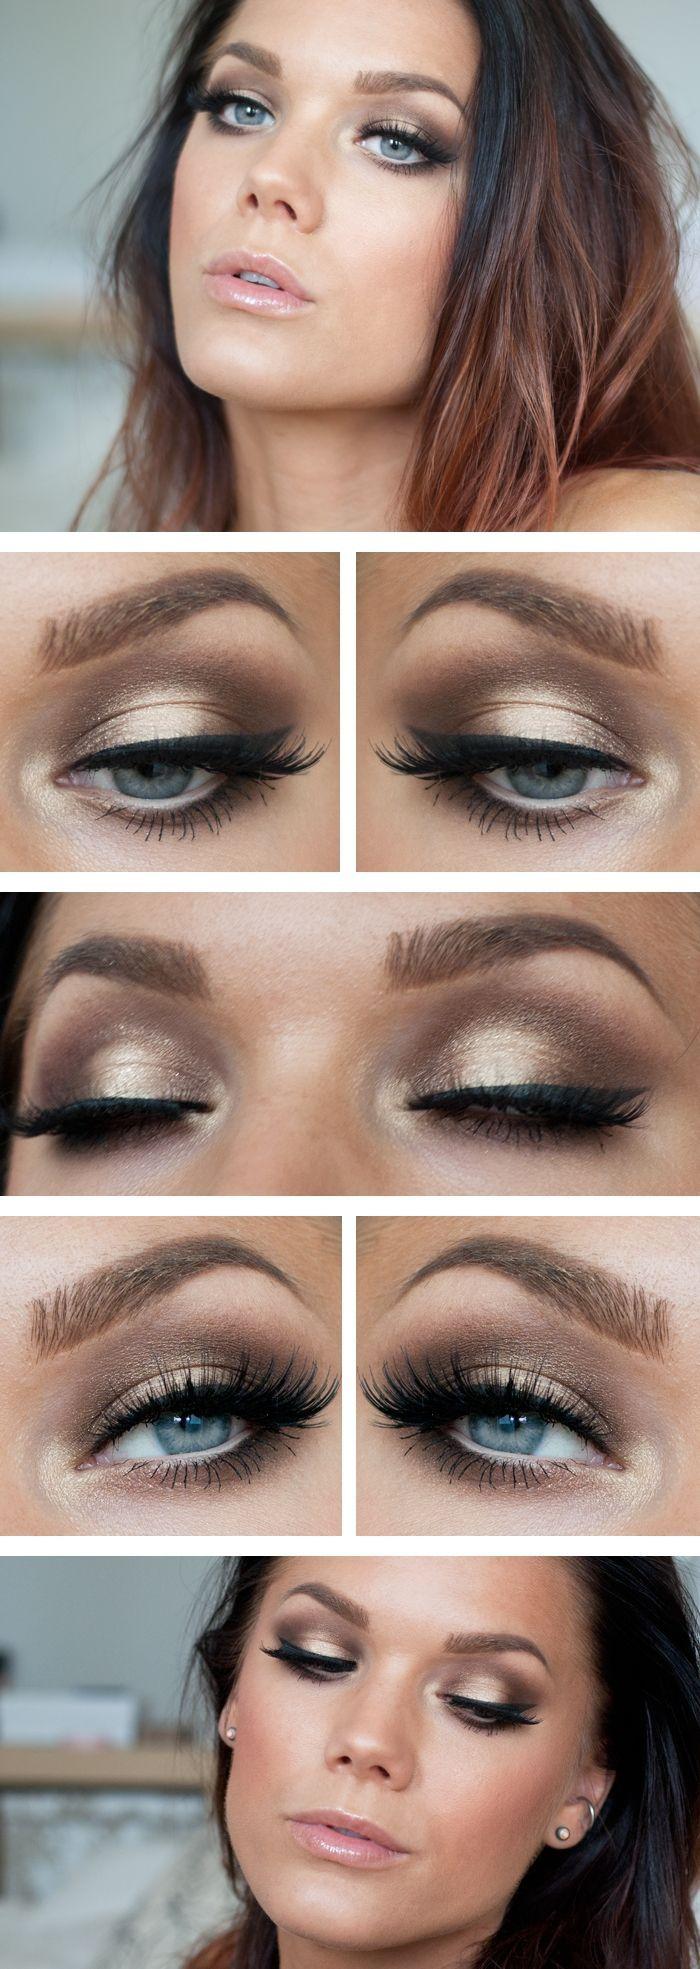 Best Make Up for Brunettes >>> http://howtochic.blogspot.it/2014/09/best-make-up-for-brunettes.html